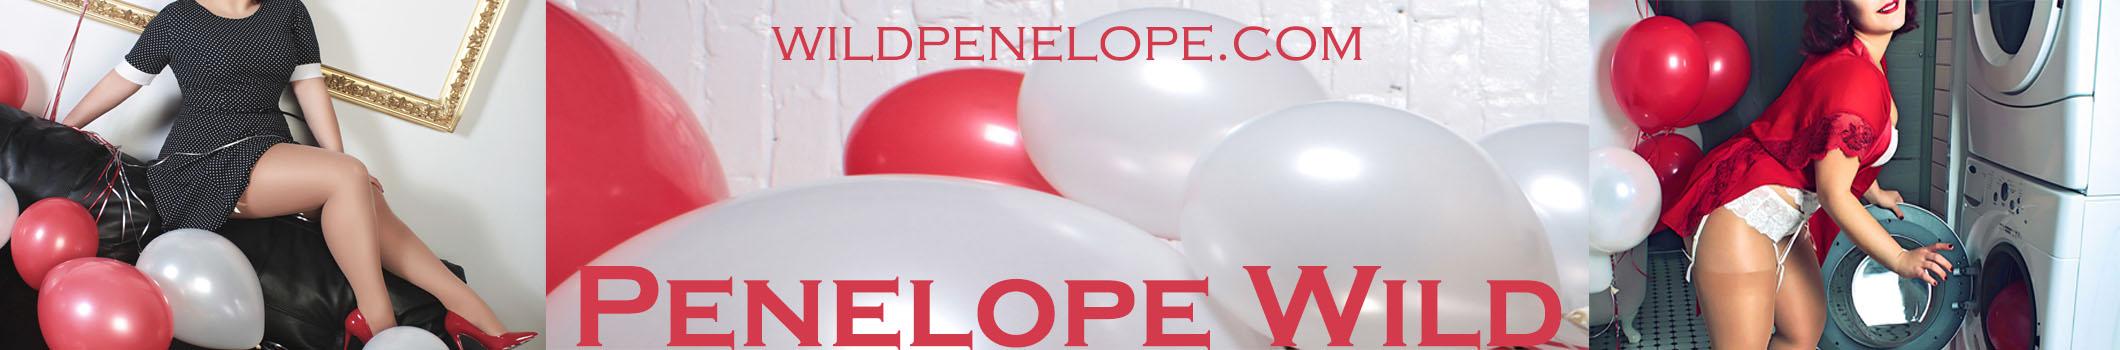 Penelope@wildpenelope.com